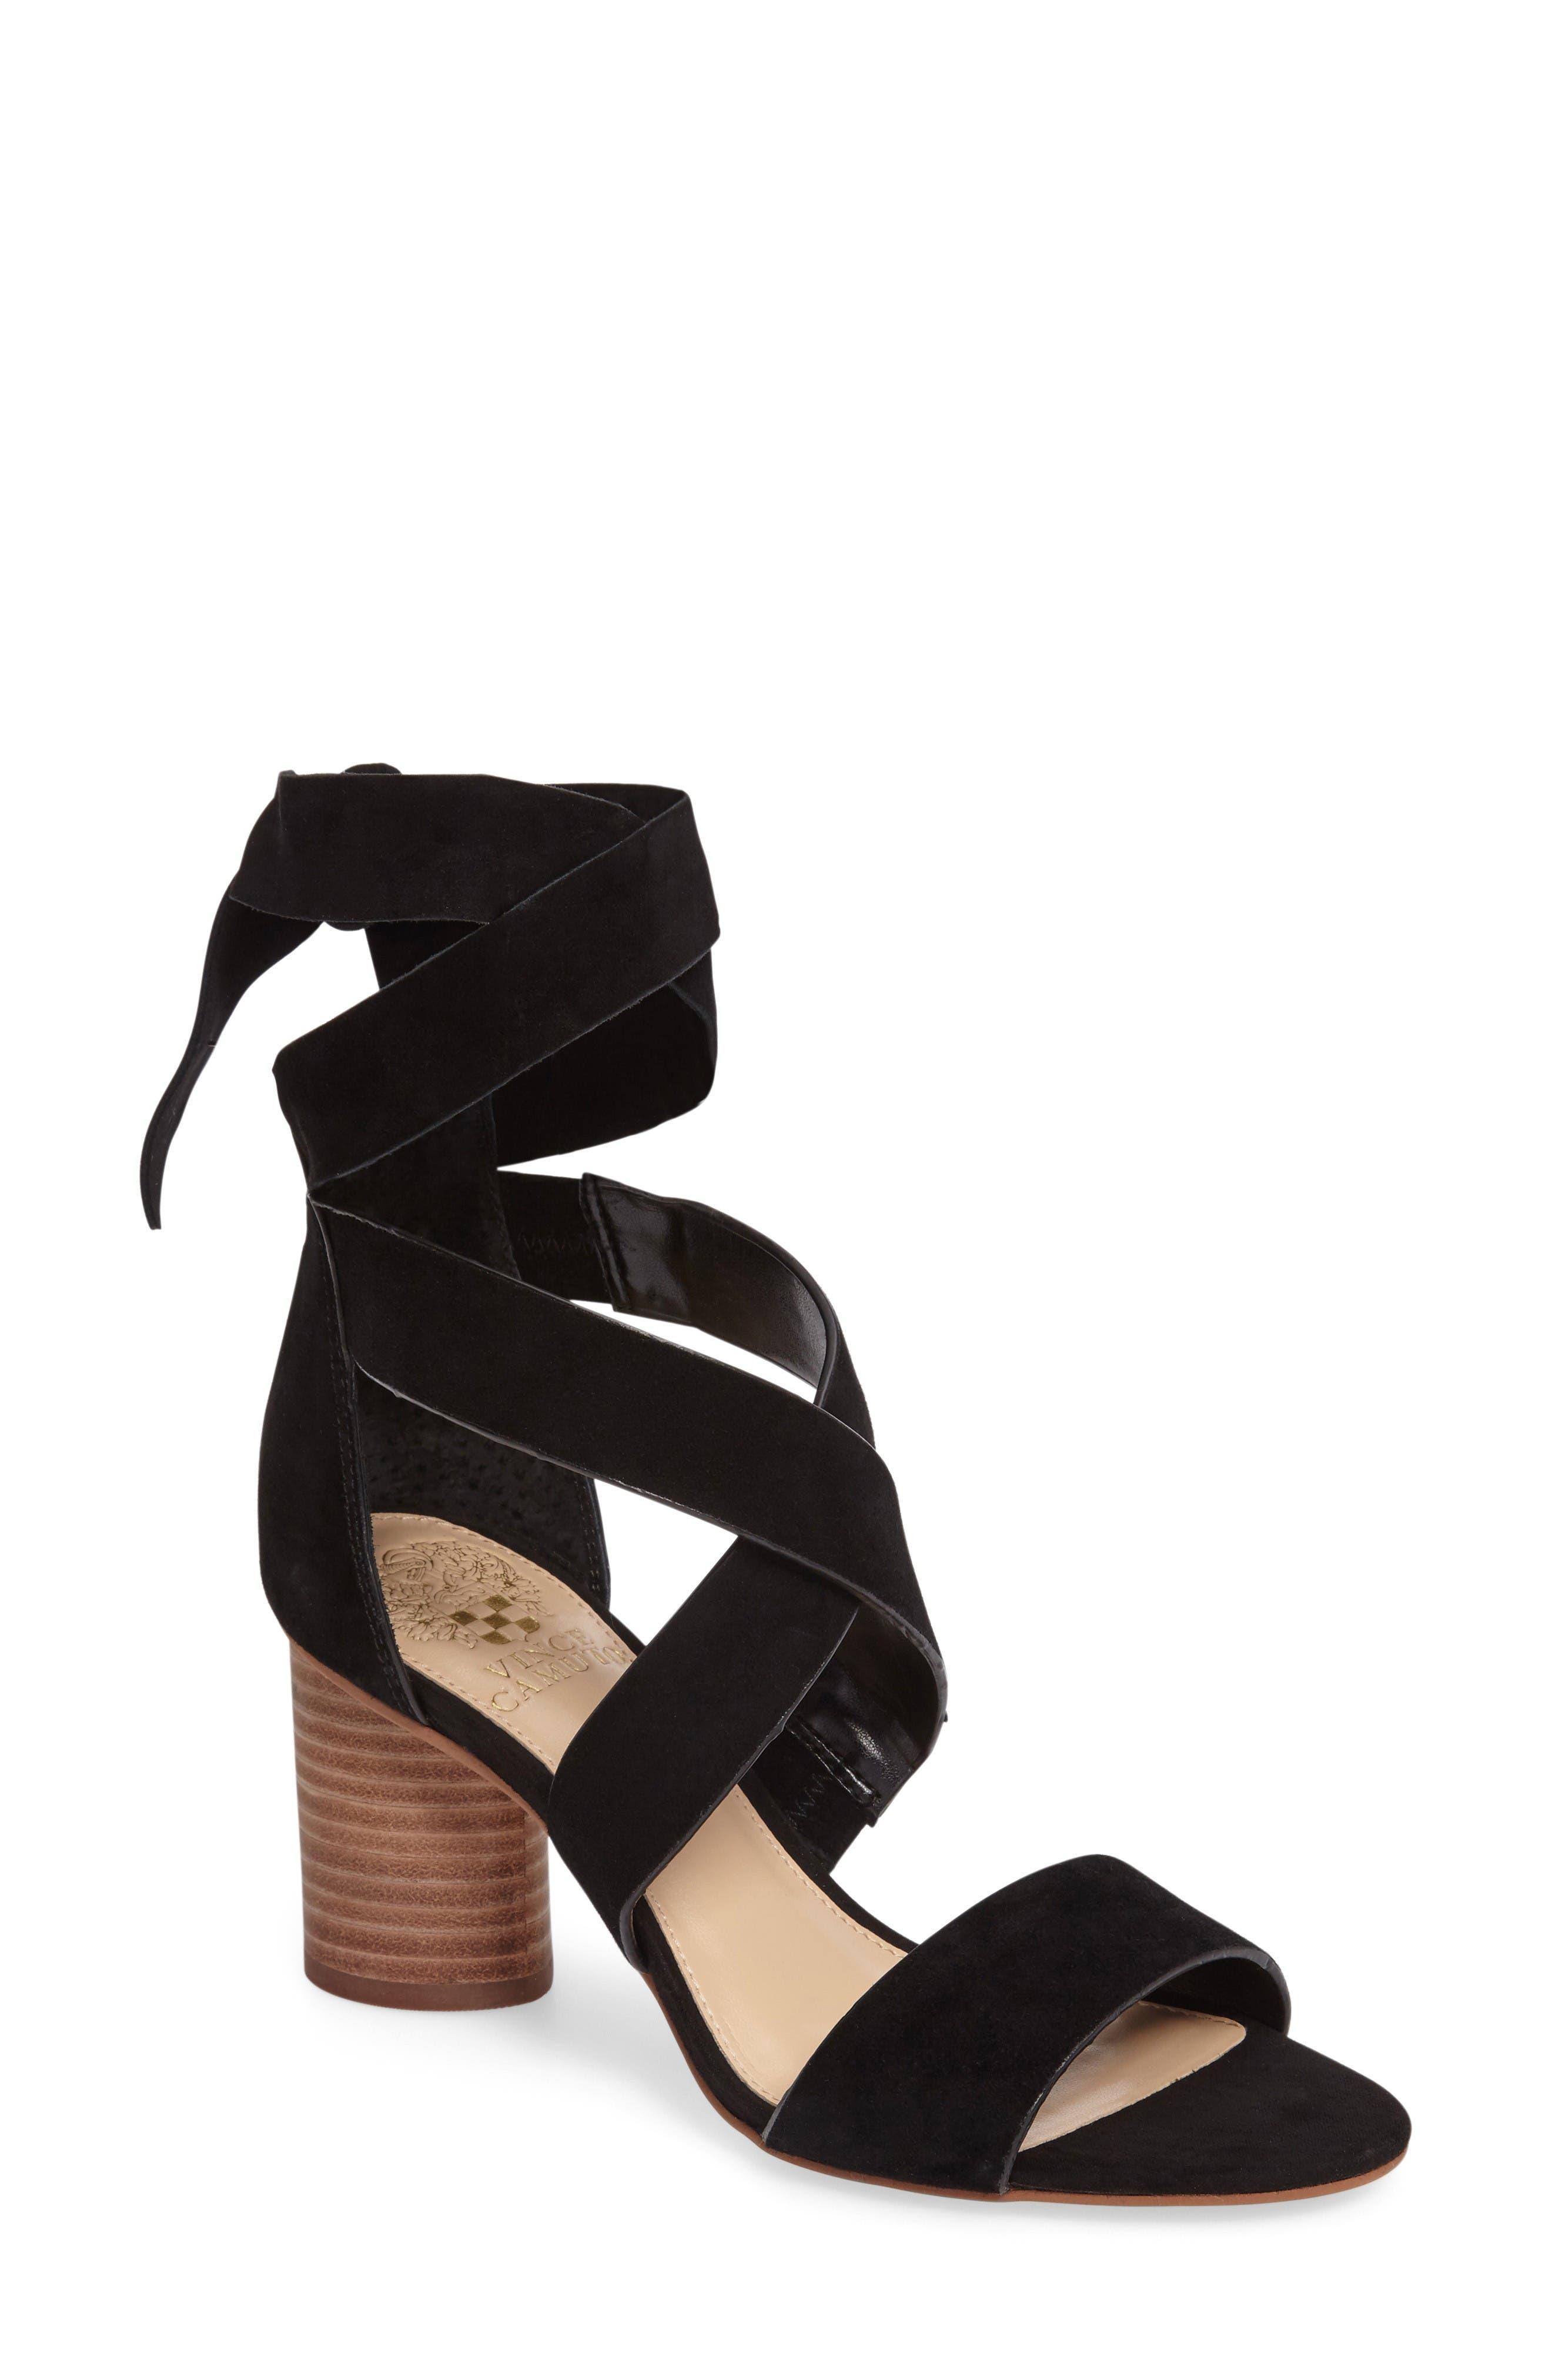 Jeneve Block Heel Sandal,                         Main,                         color, Black Suede